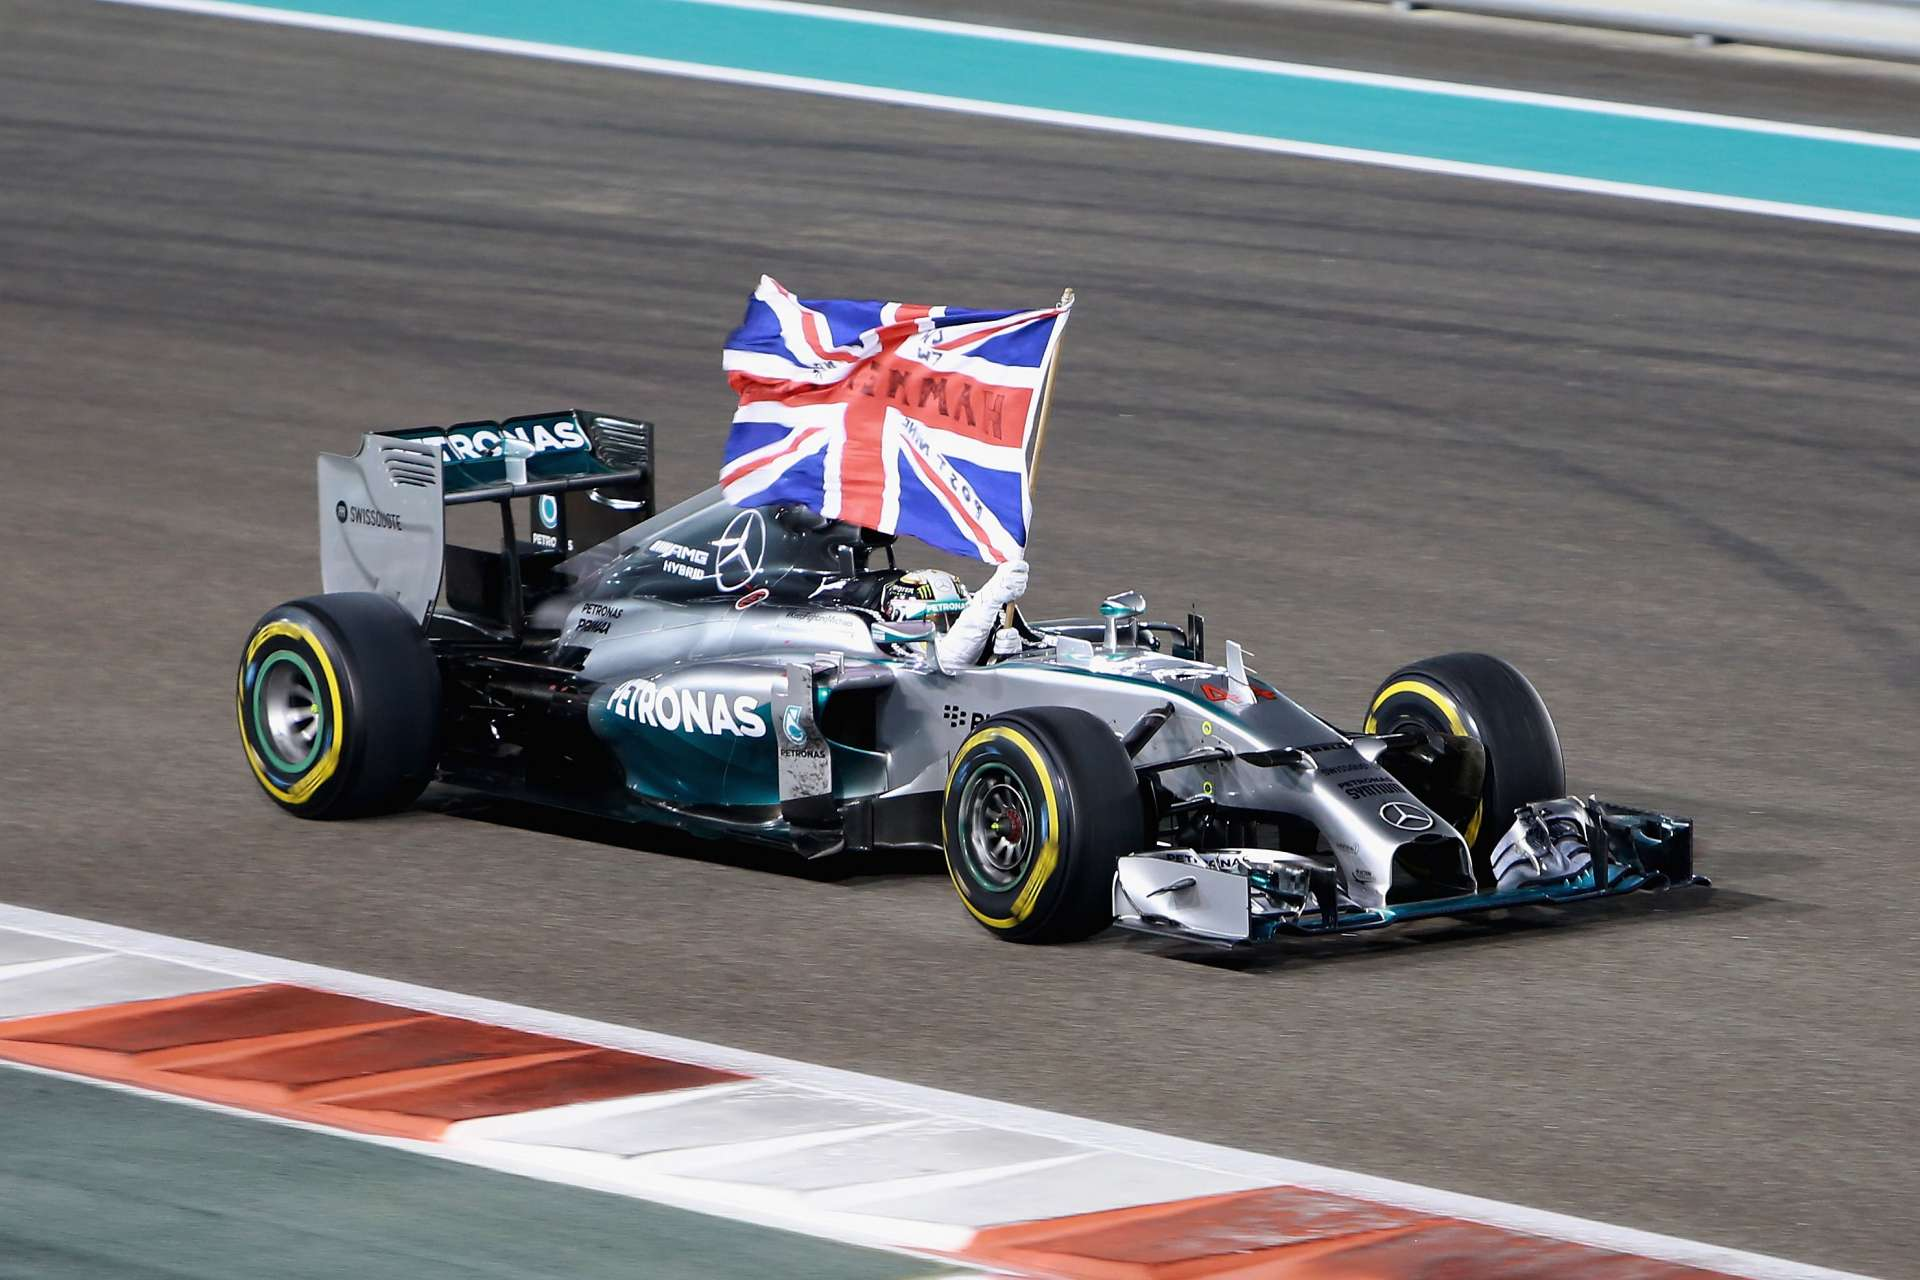 Lewis Hamilton mercedes abu dhabi f1 2014. celebration